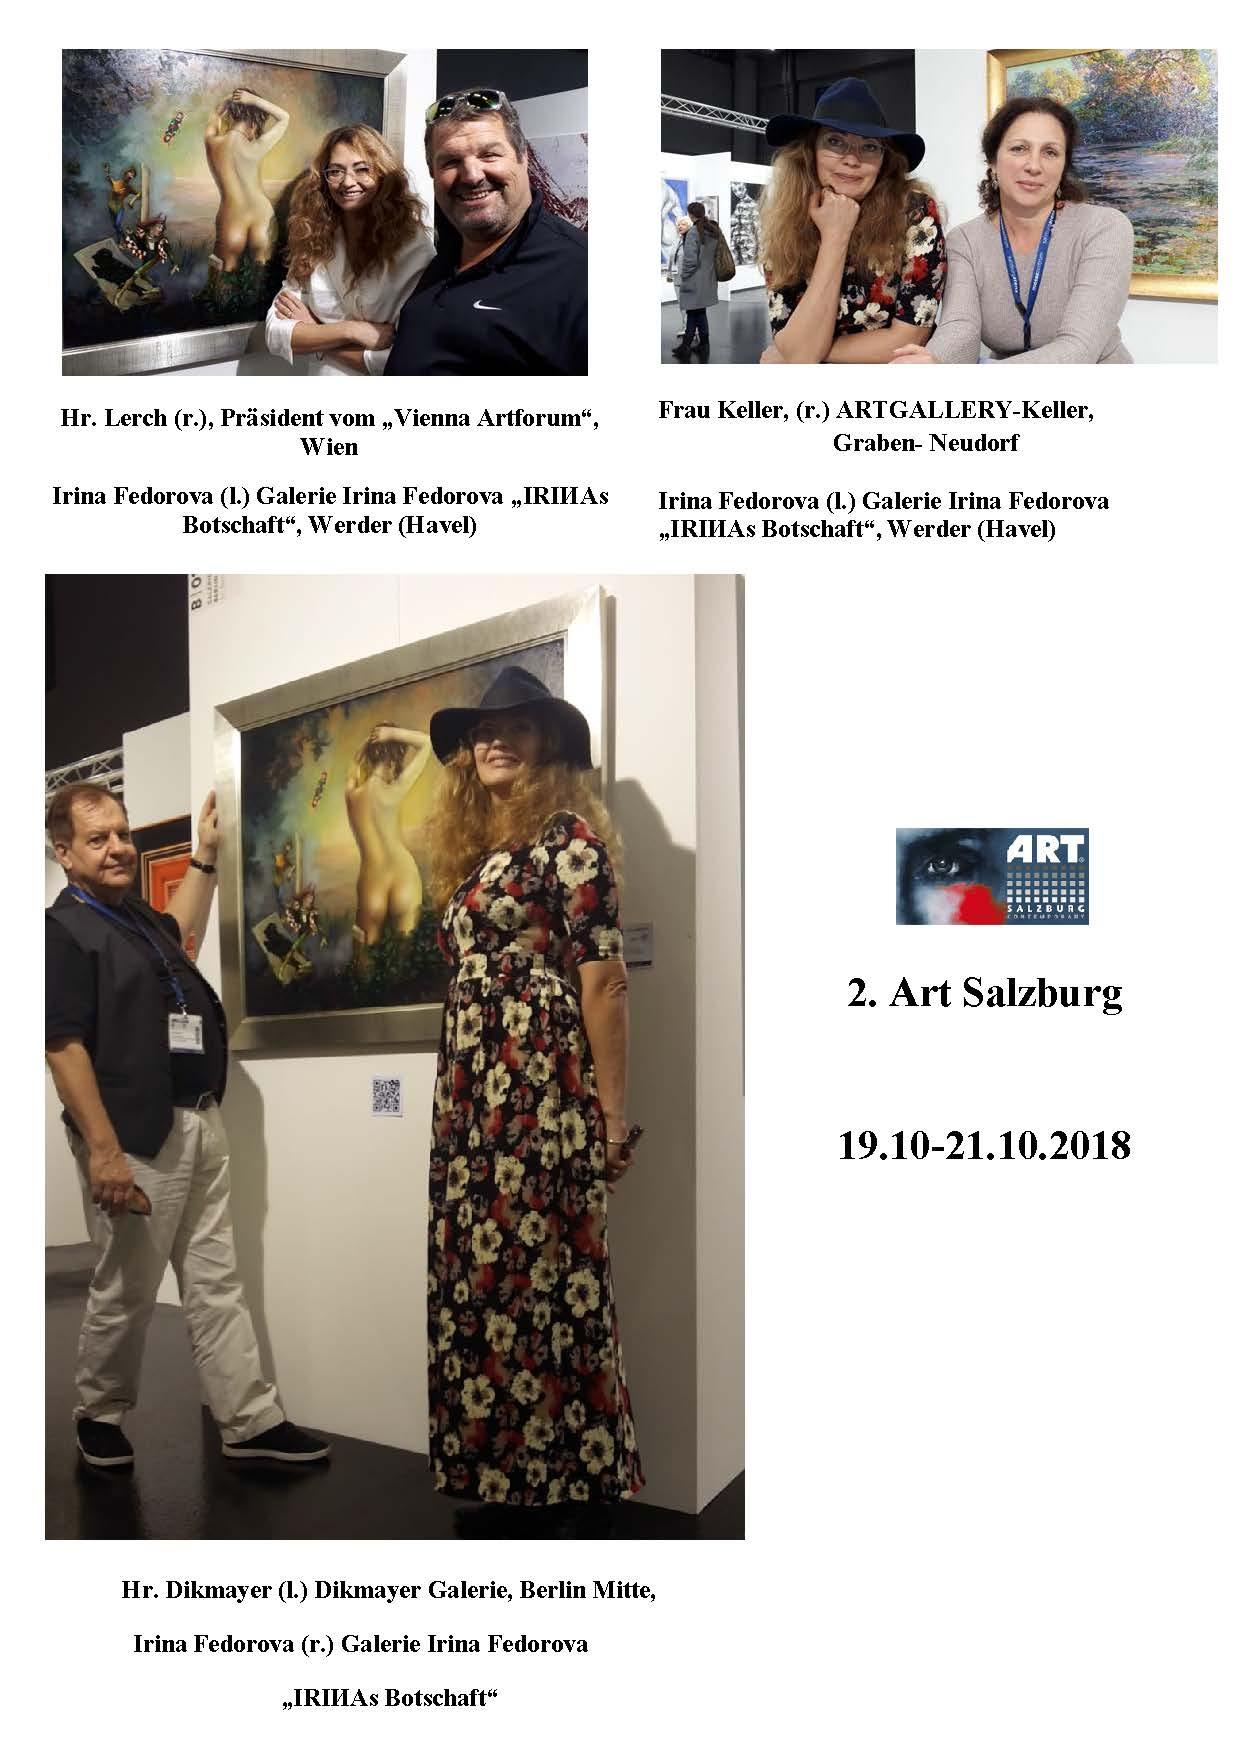 2. Art Salzburg